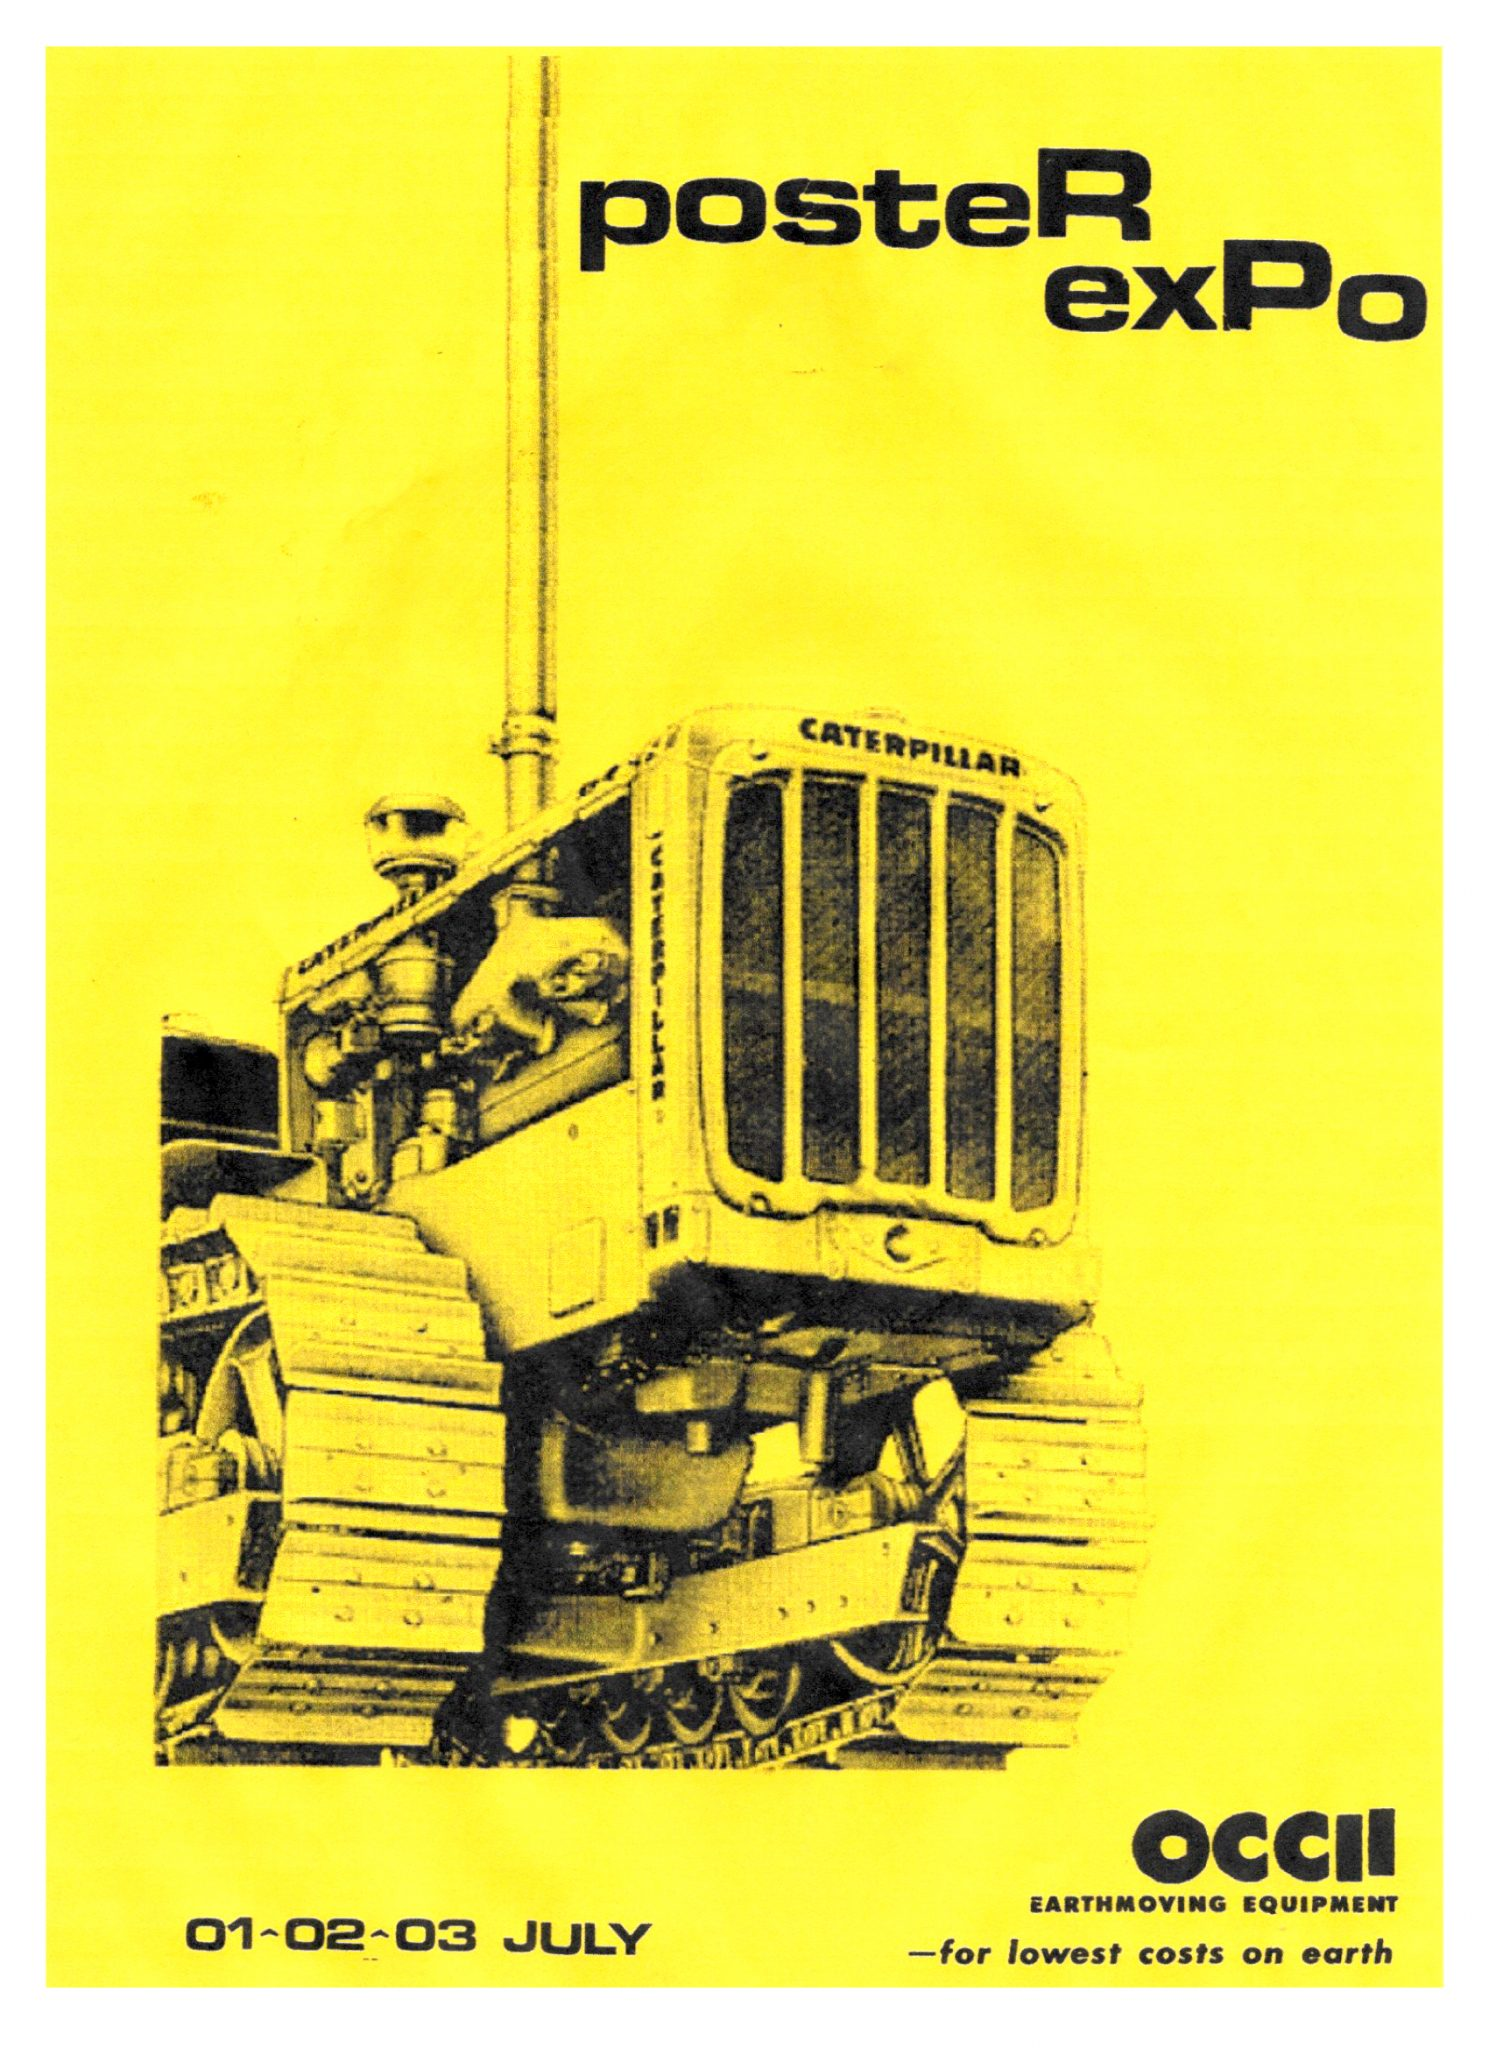 OCCII POSTER EXPO